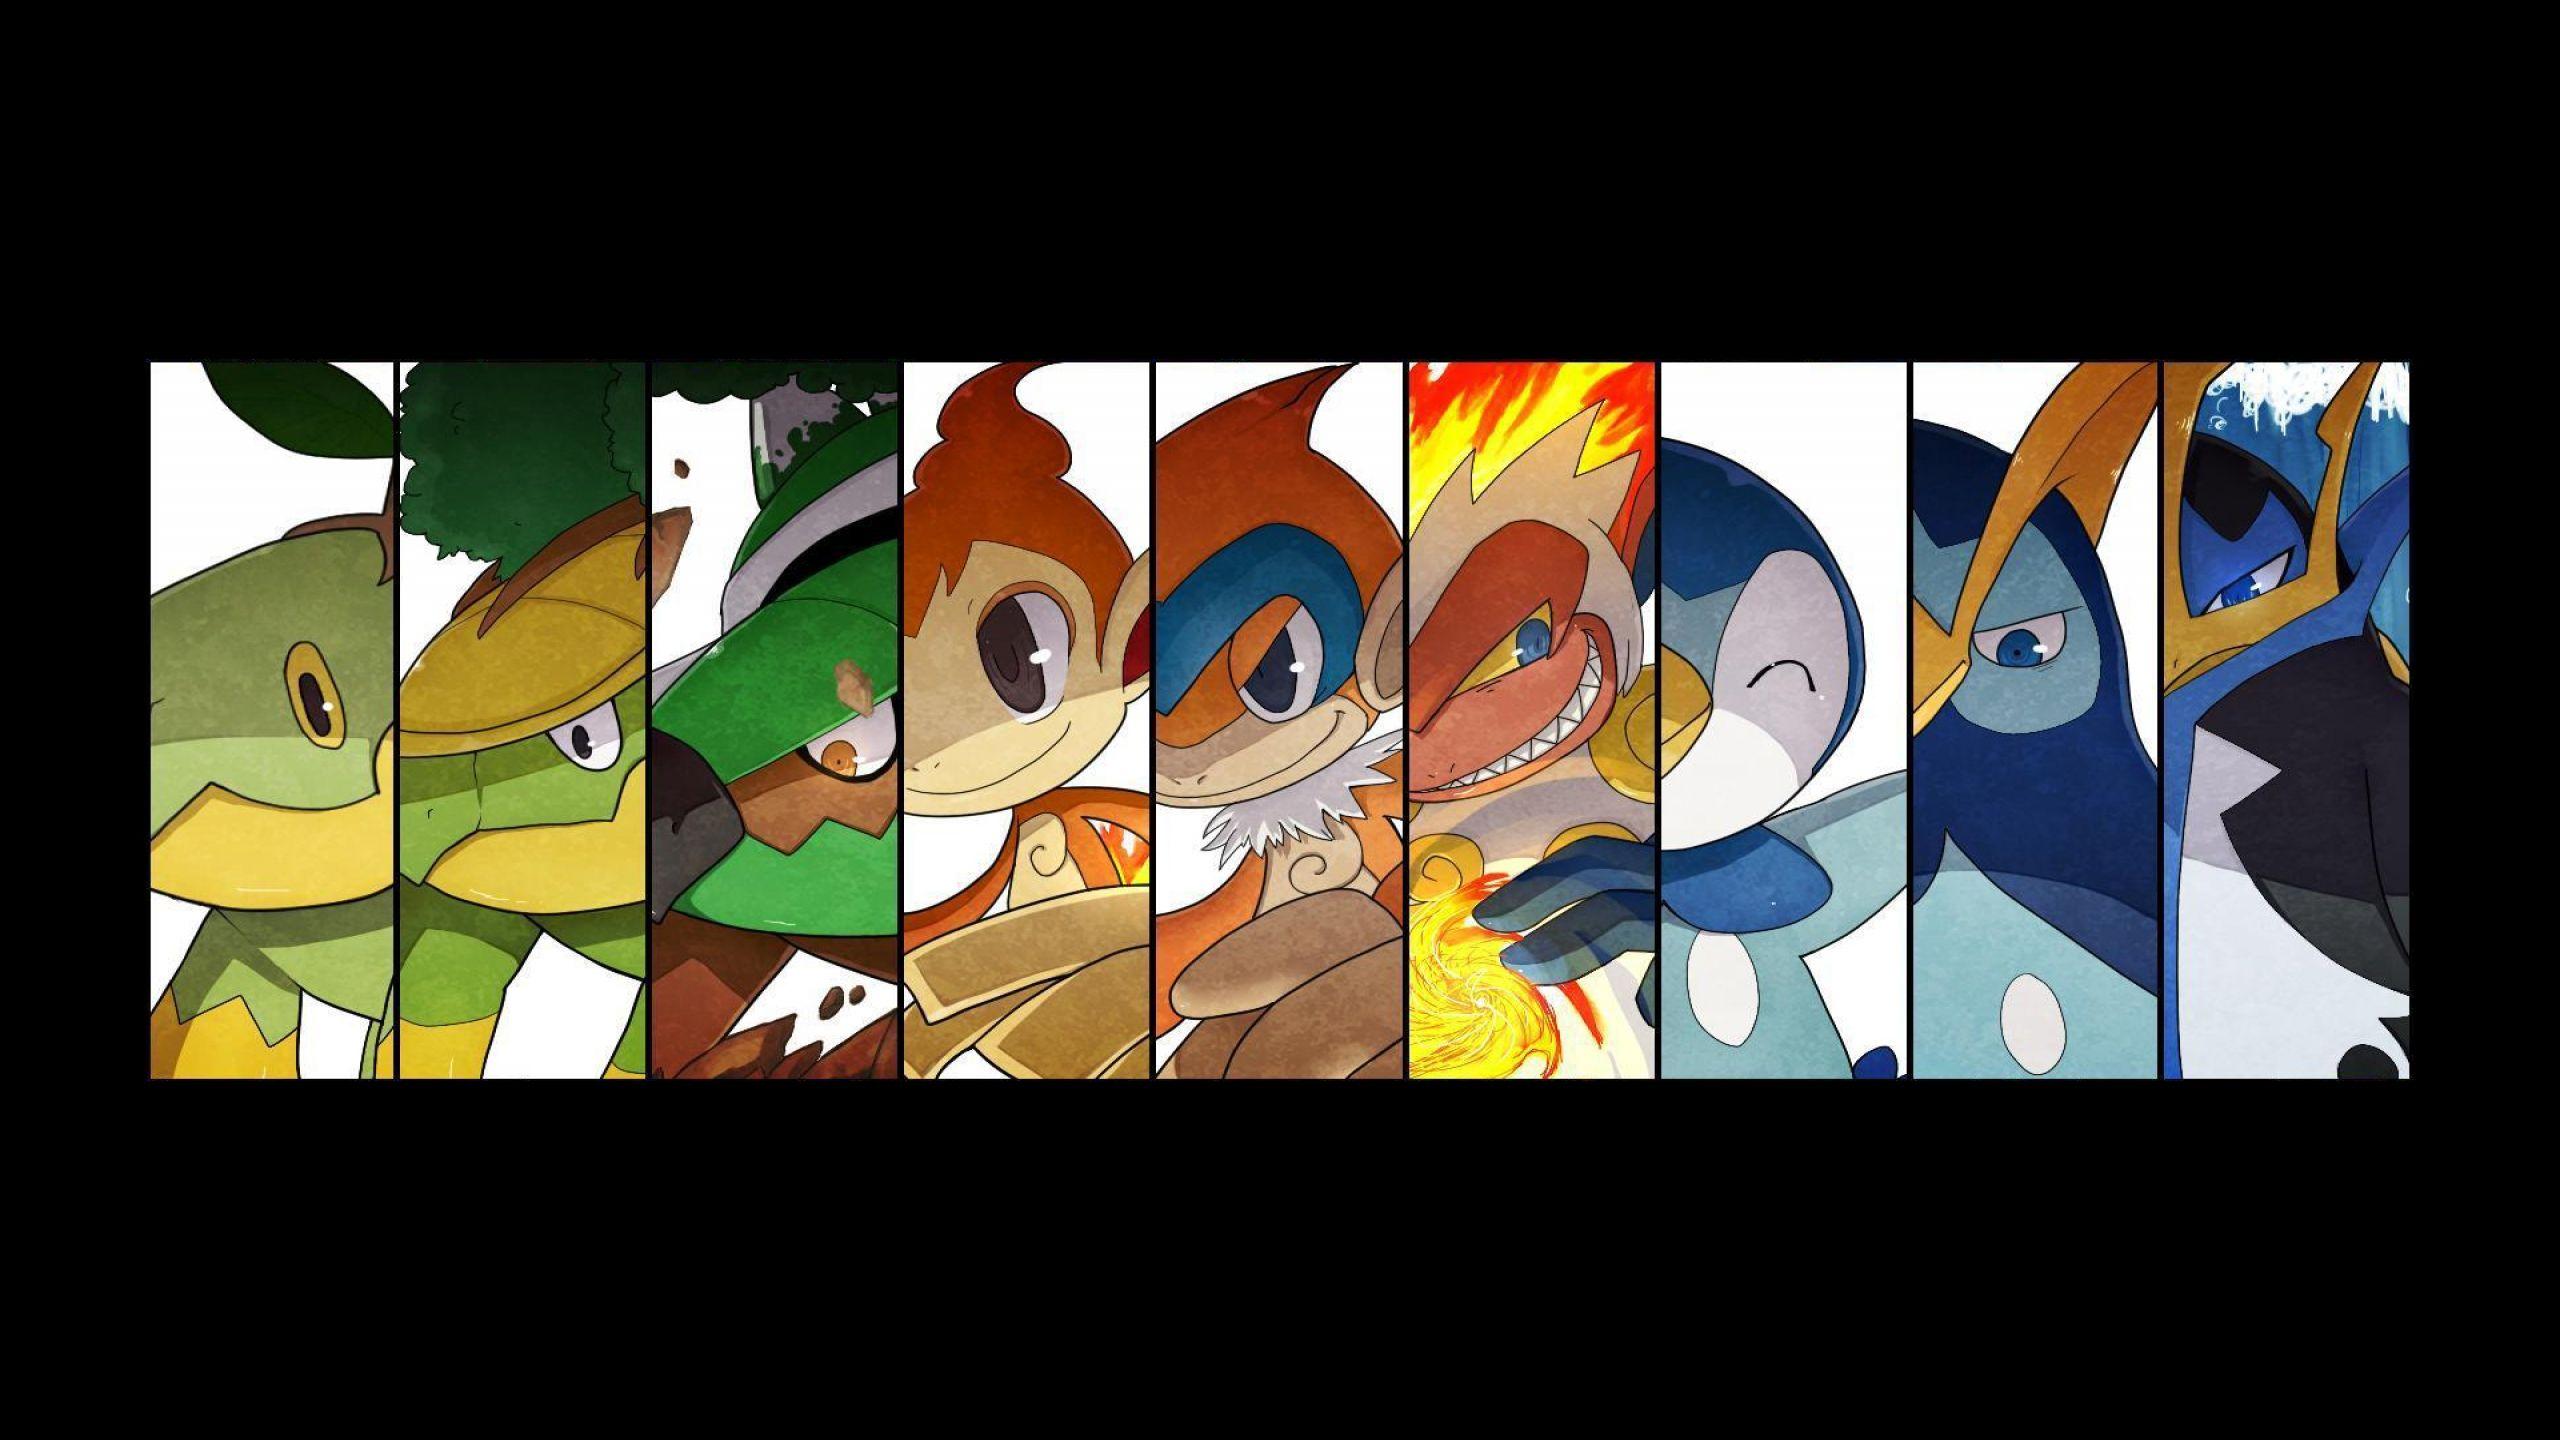 Chimchar 2560x1440 Pokemon Turtwig Grotle Torterra Chimchar